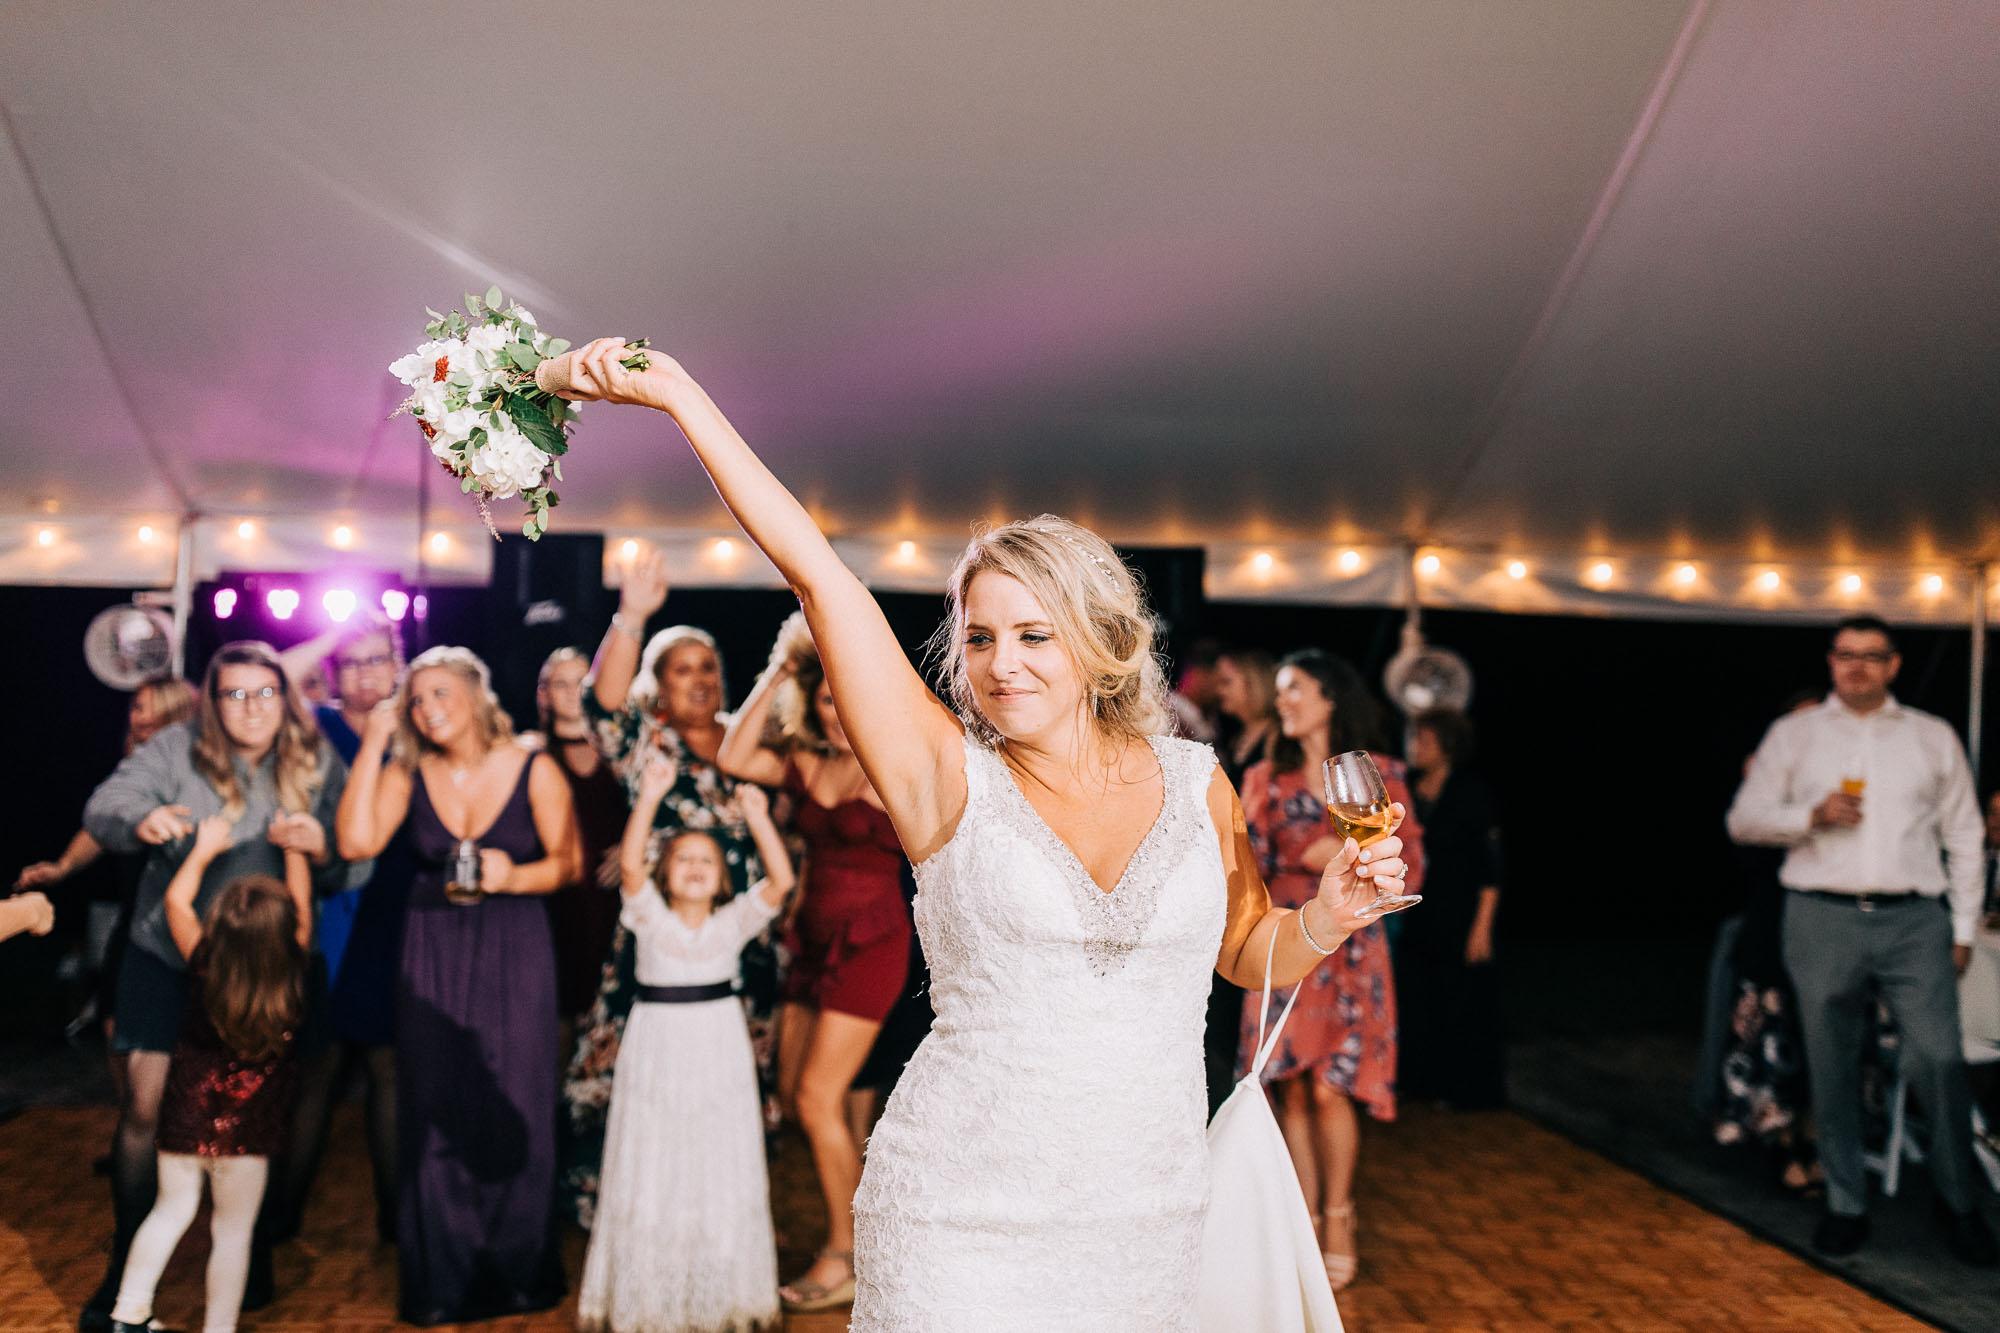 Lodge-at-Raven-Creek-October-wedding-87.jpg